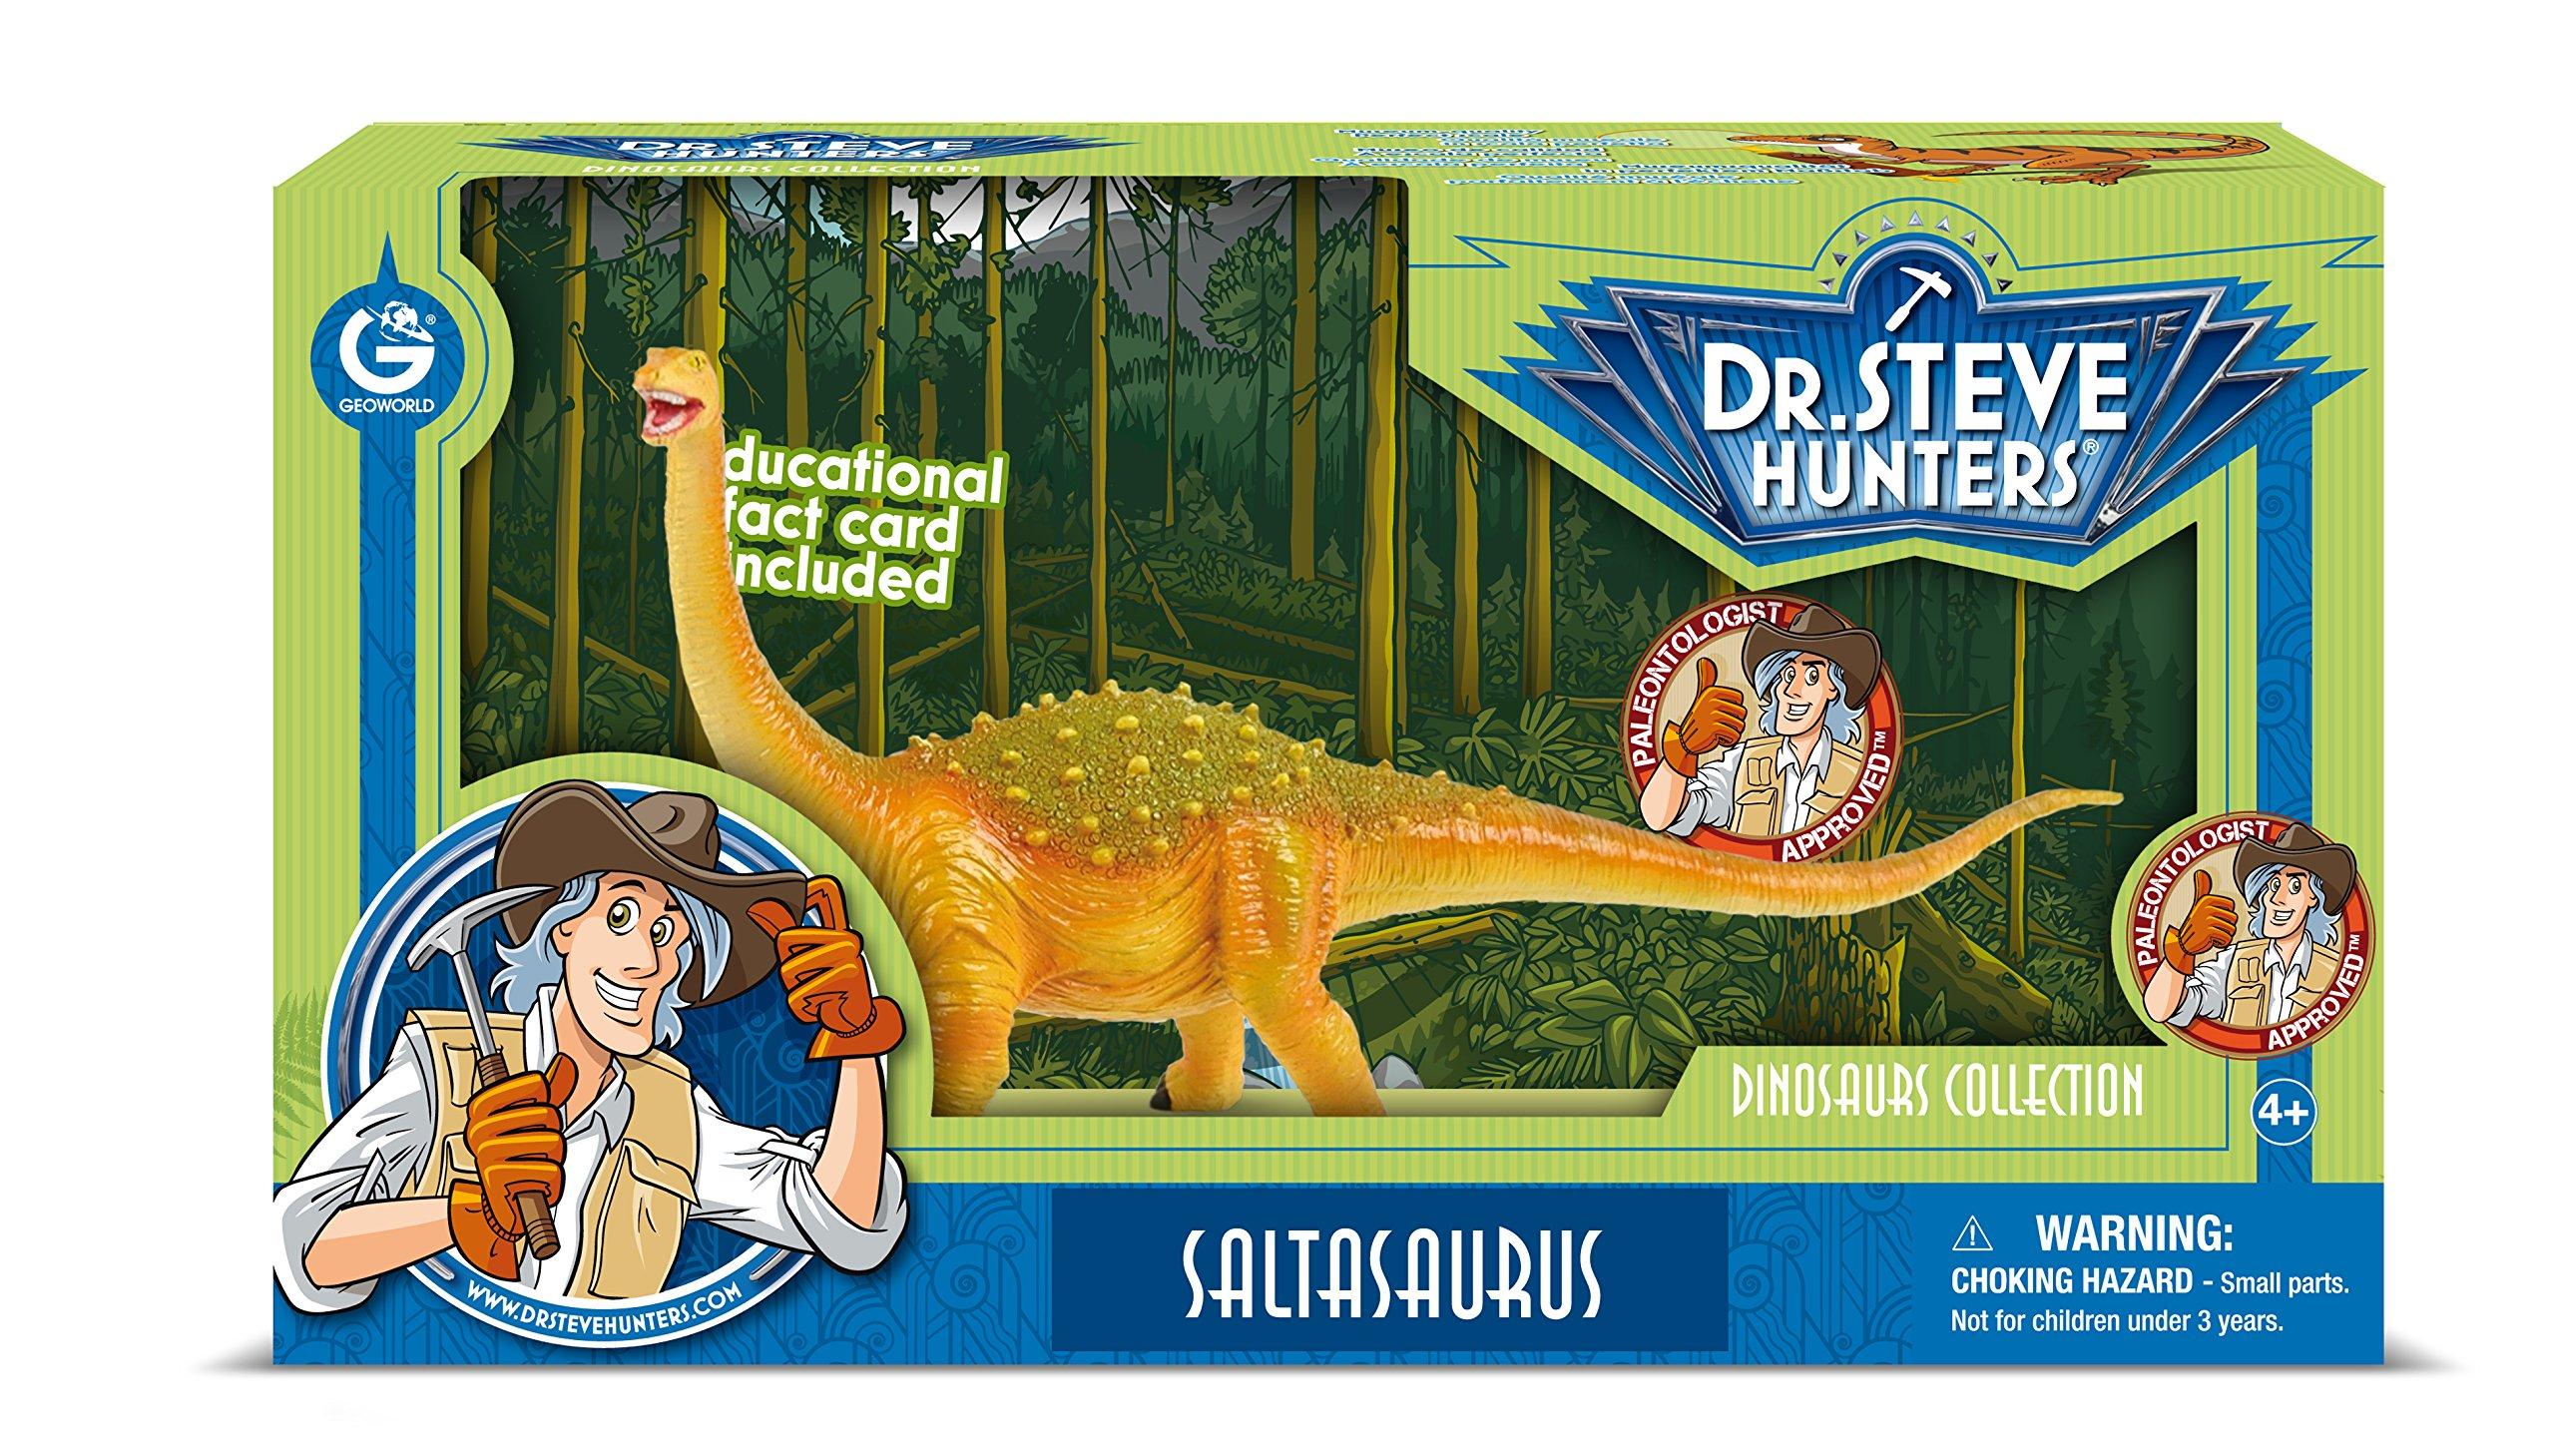 Dr. Steve Hunters cl1609K-Collection of Dinosaurs: Model Saltasaurus